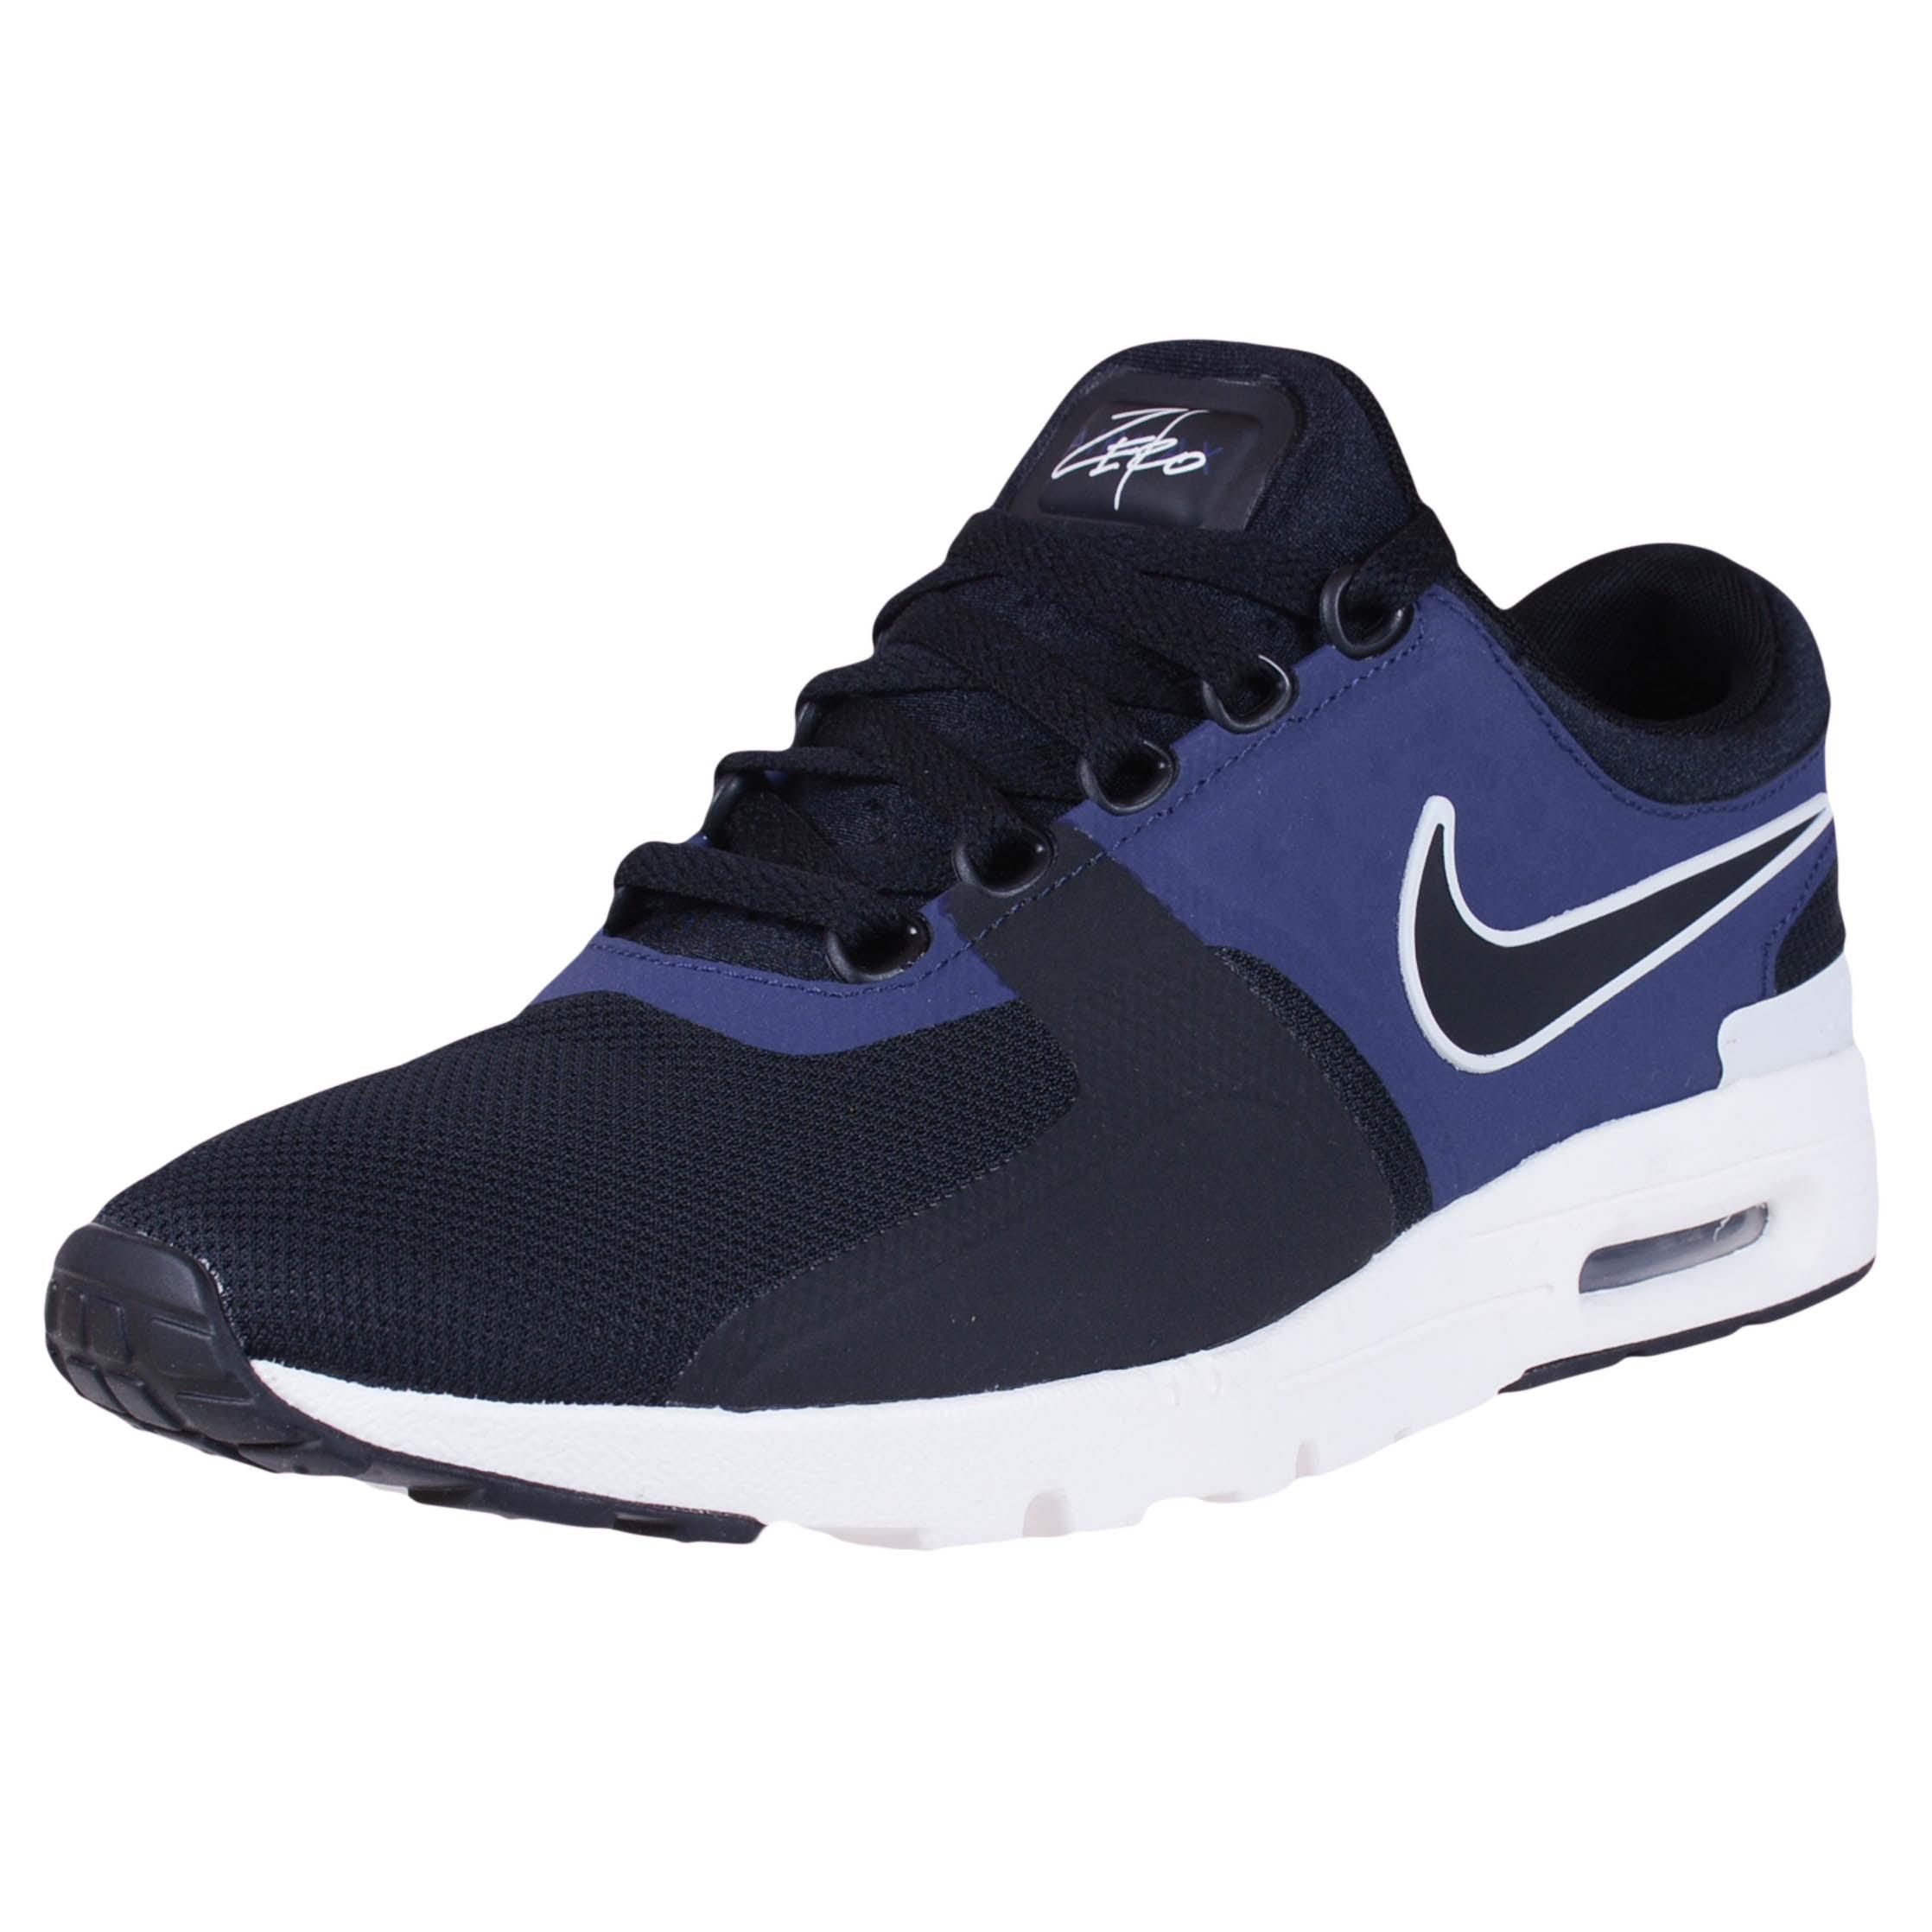 Nike WOMENS AIR MAX ZERO RETRO RUNNING SHOES BLACK IVORY ...